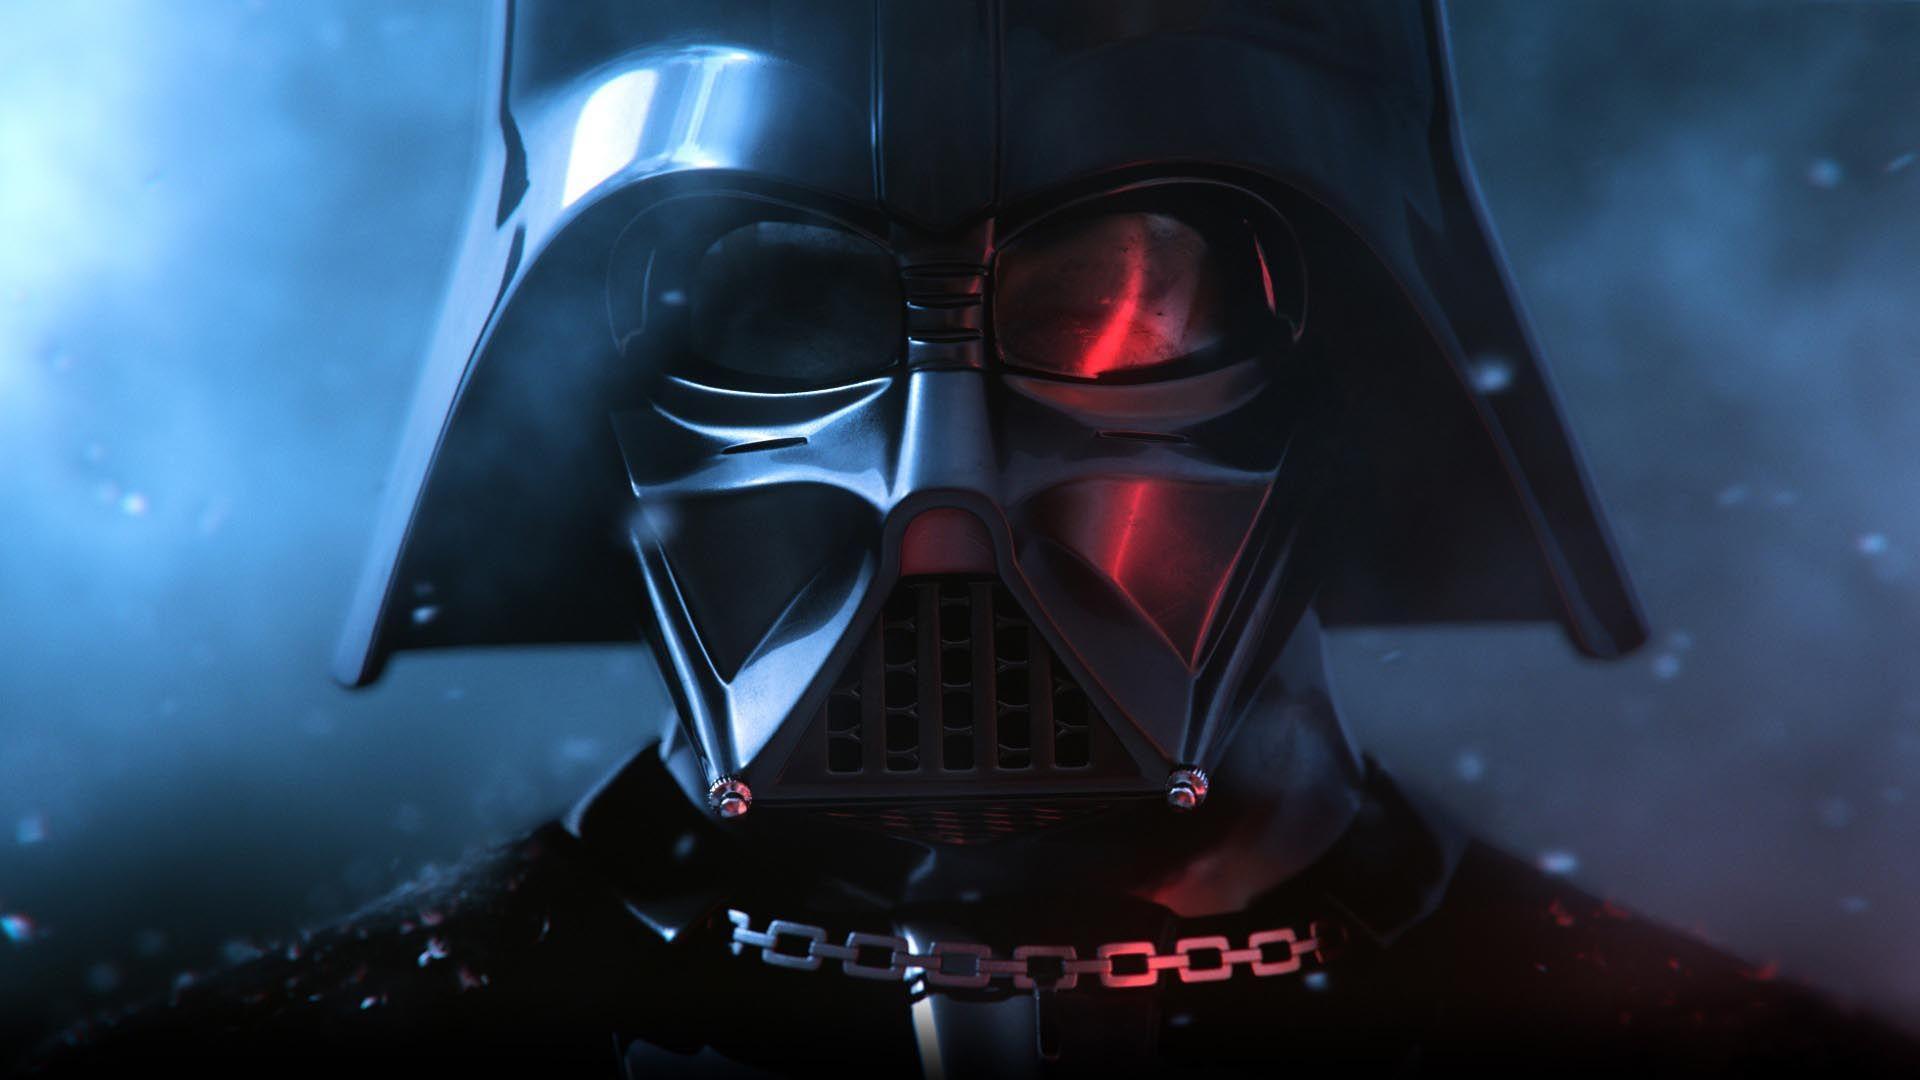 Wallpapers Star Wars Darth Vader Full Hd 1920x1080 Darth Vader Wallpaper Star Wars Wallpaper Star Wars Poster